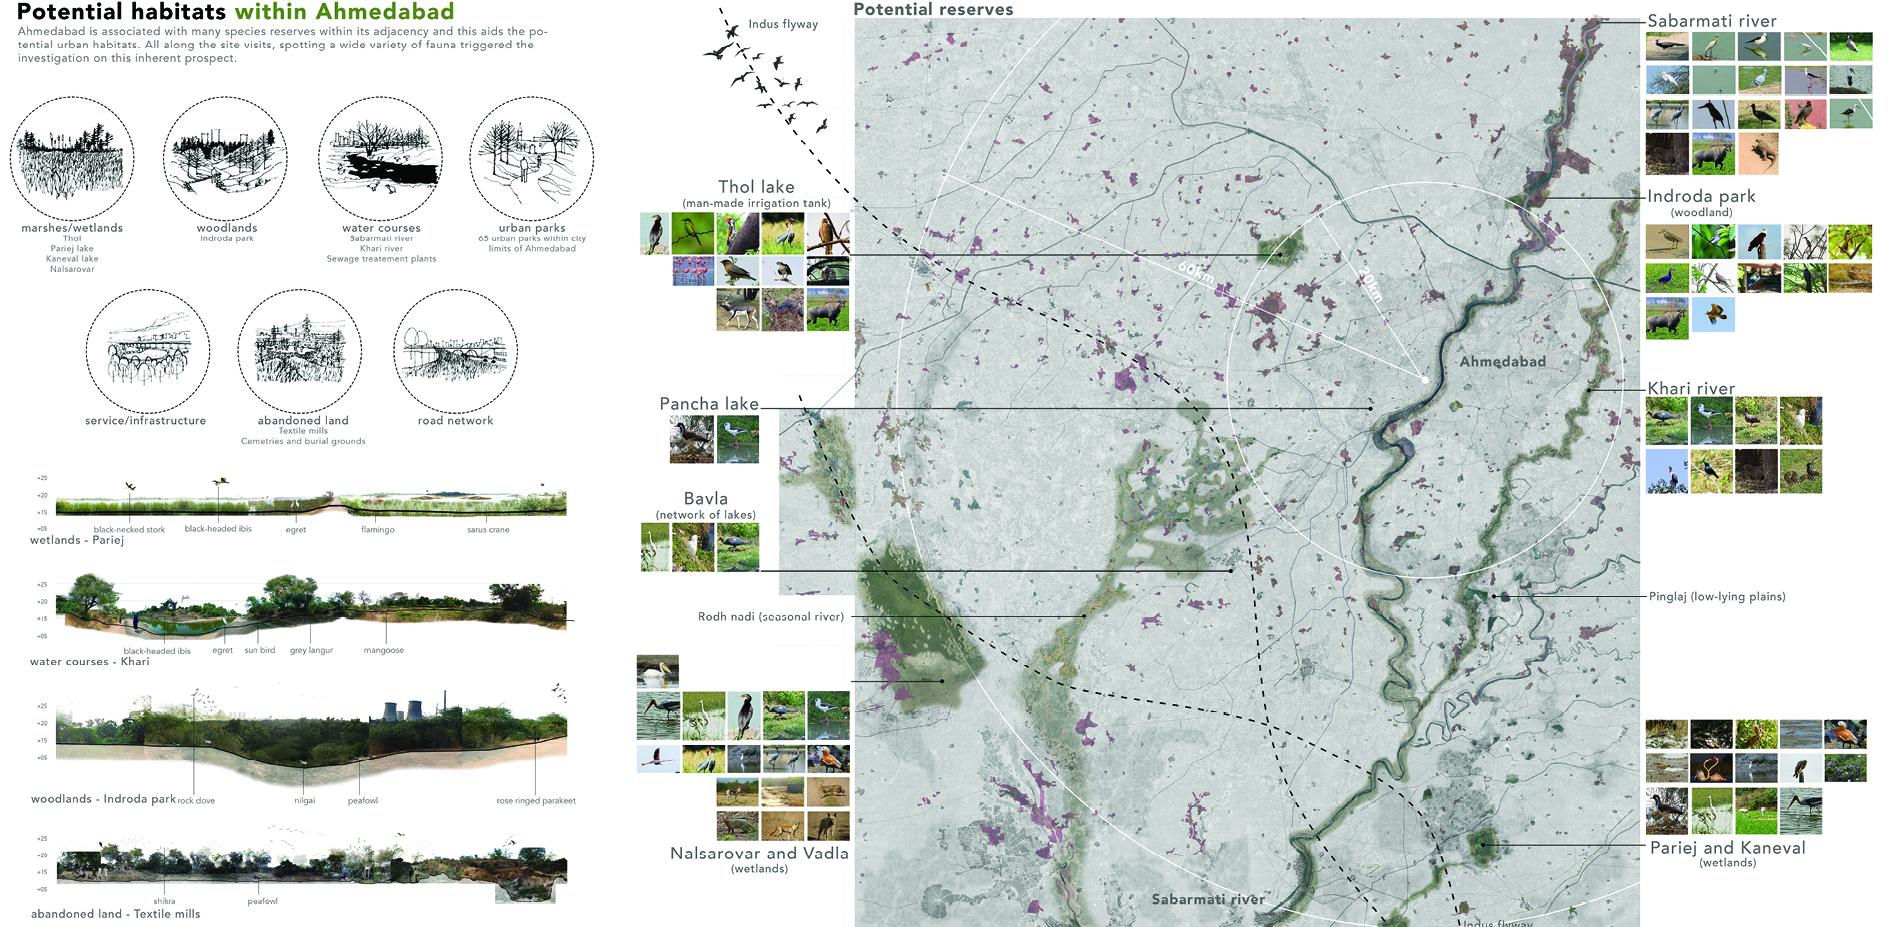 Potential habitats within Ahmedabad